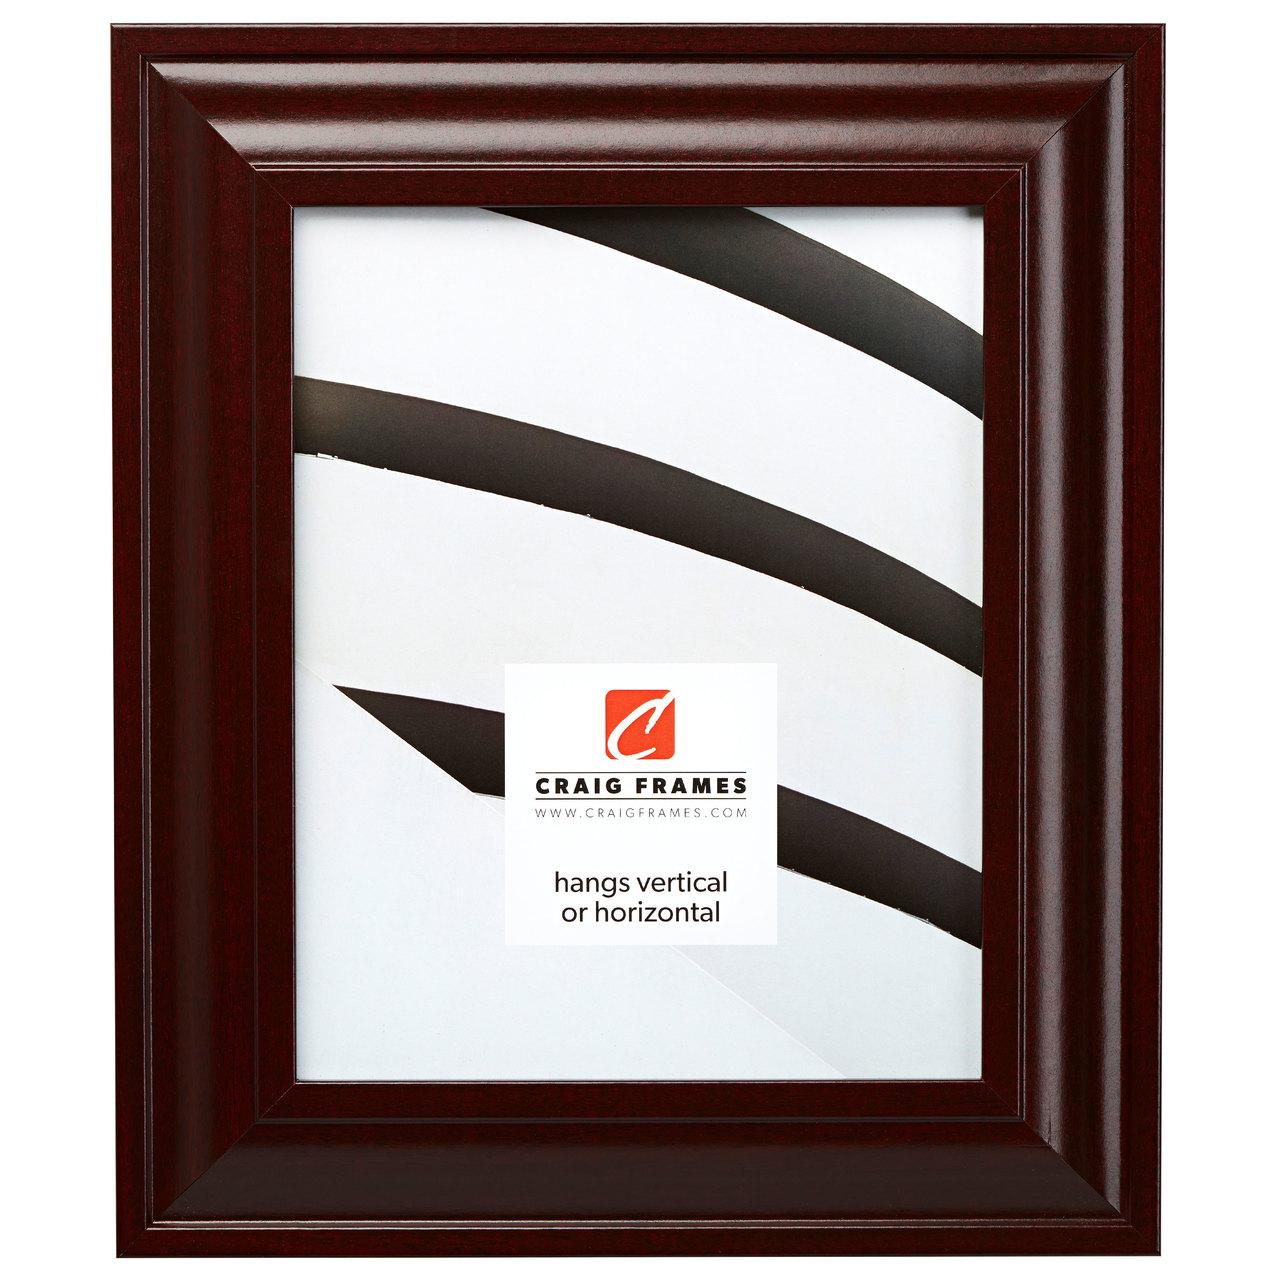 "Upscale 2"", Dark Mahogany Picture Frame"